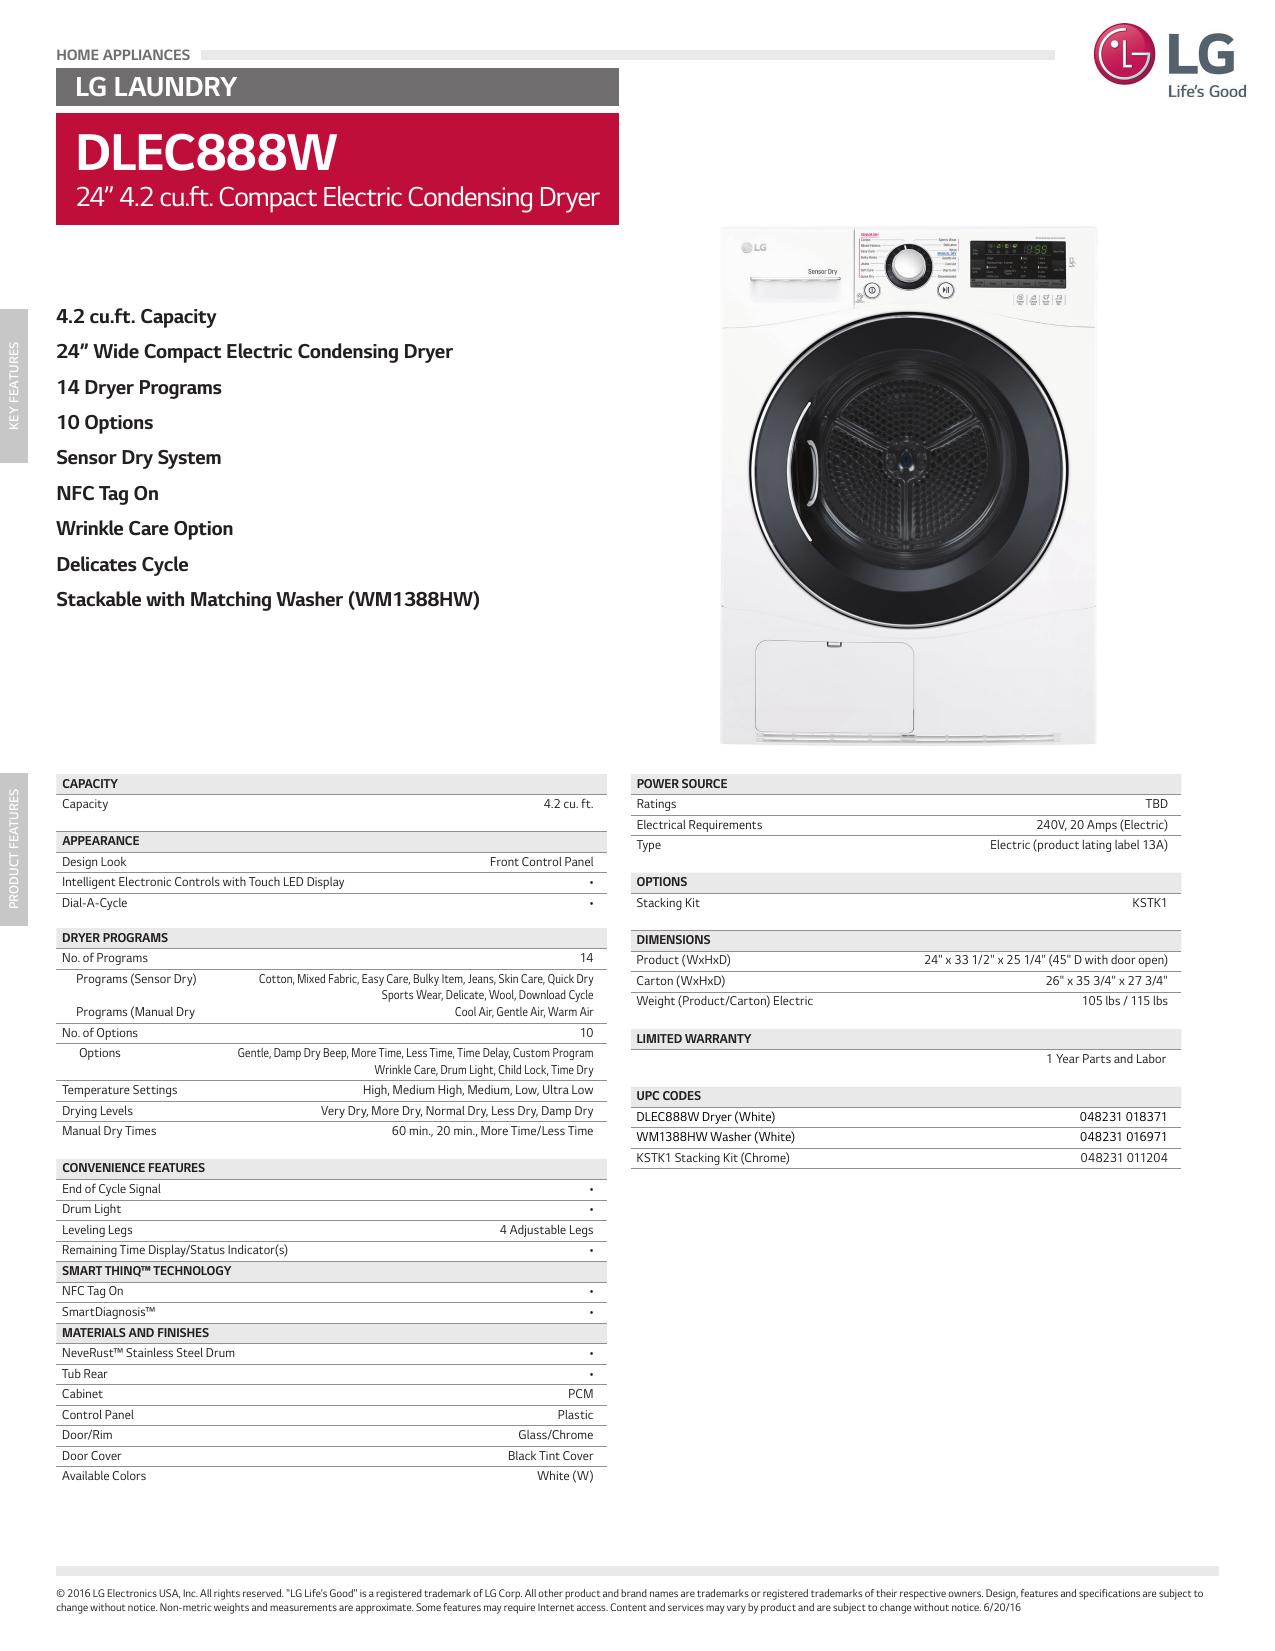 LG DLEC888W Specifications Sheet | manualzz com